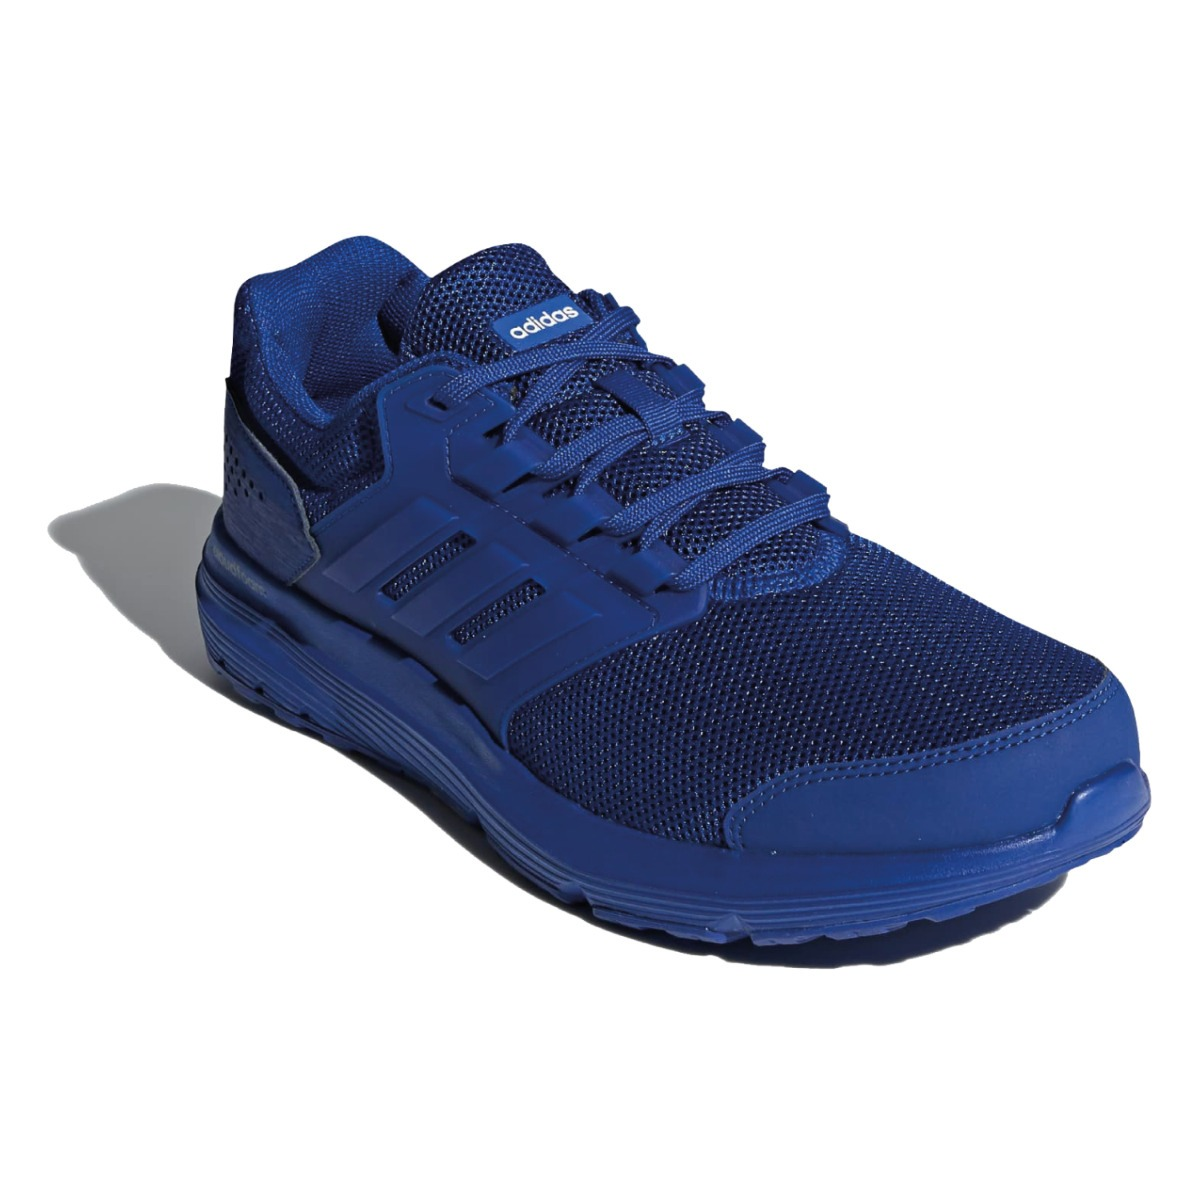 size 40 95408 14da3 tenis adidas galaxy 4m azul original hombre cp8831. Cargando zoom... tenis  adidas hombre. Cargando zoom.